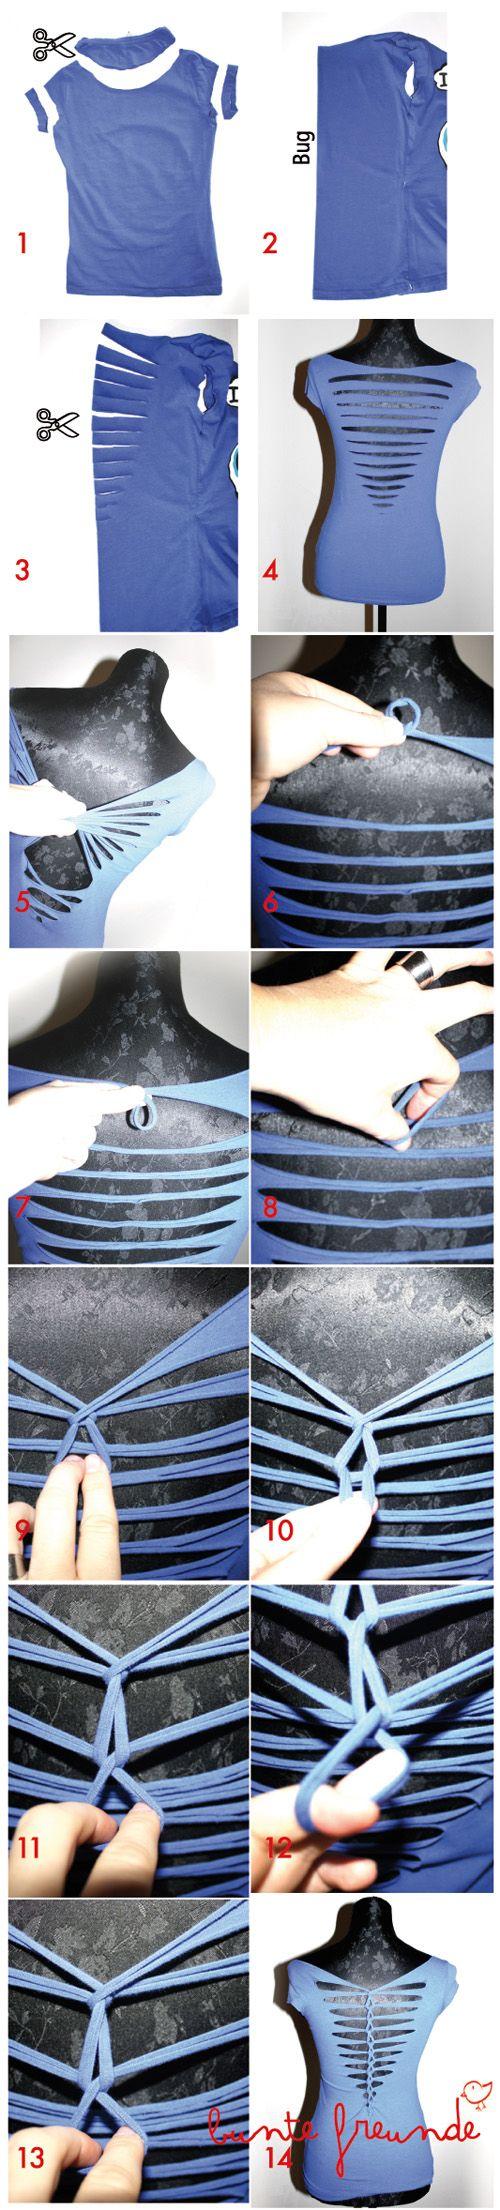 Tutorial Cutting Weaving Braiding Shirt Anleitung